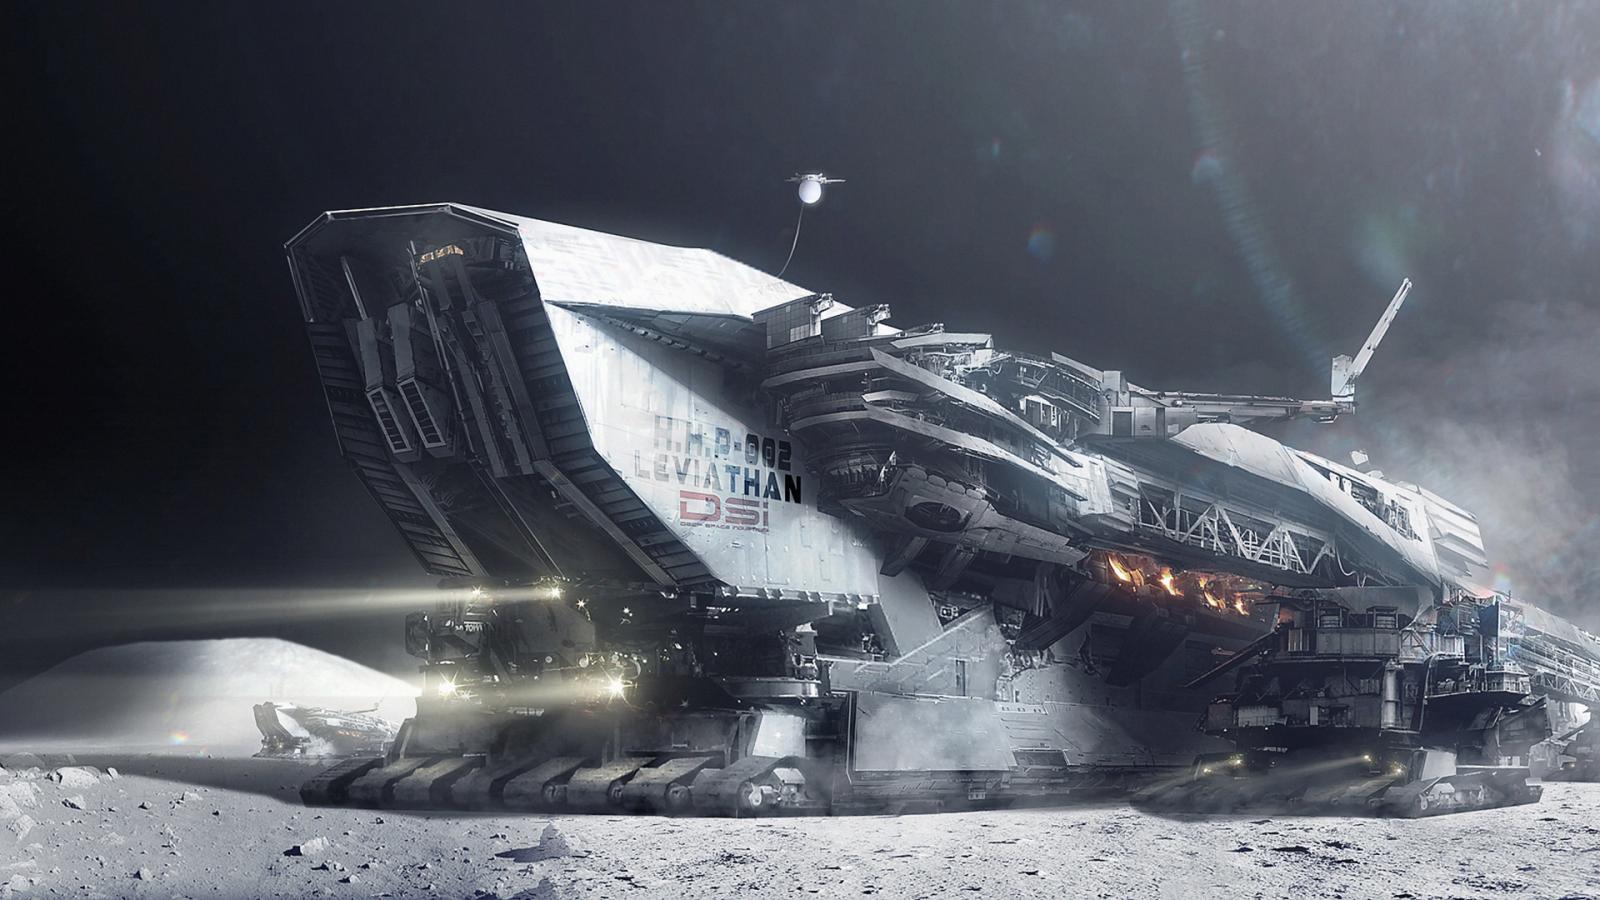 fantasy art, hely, hó, jármű, hold film, screenshot, űrhajó